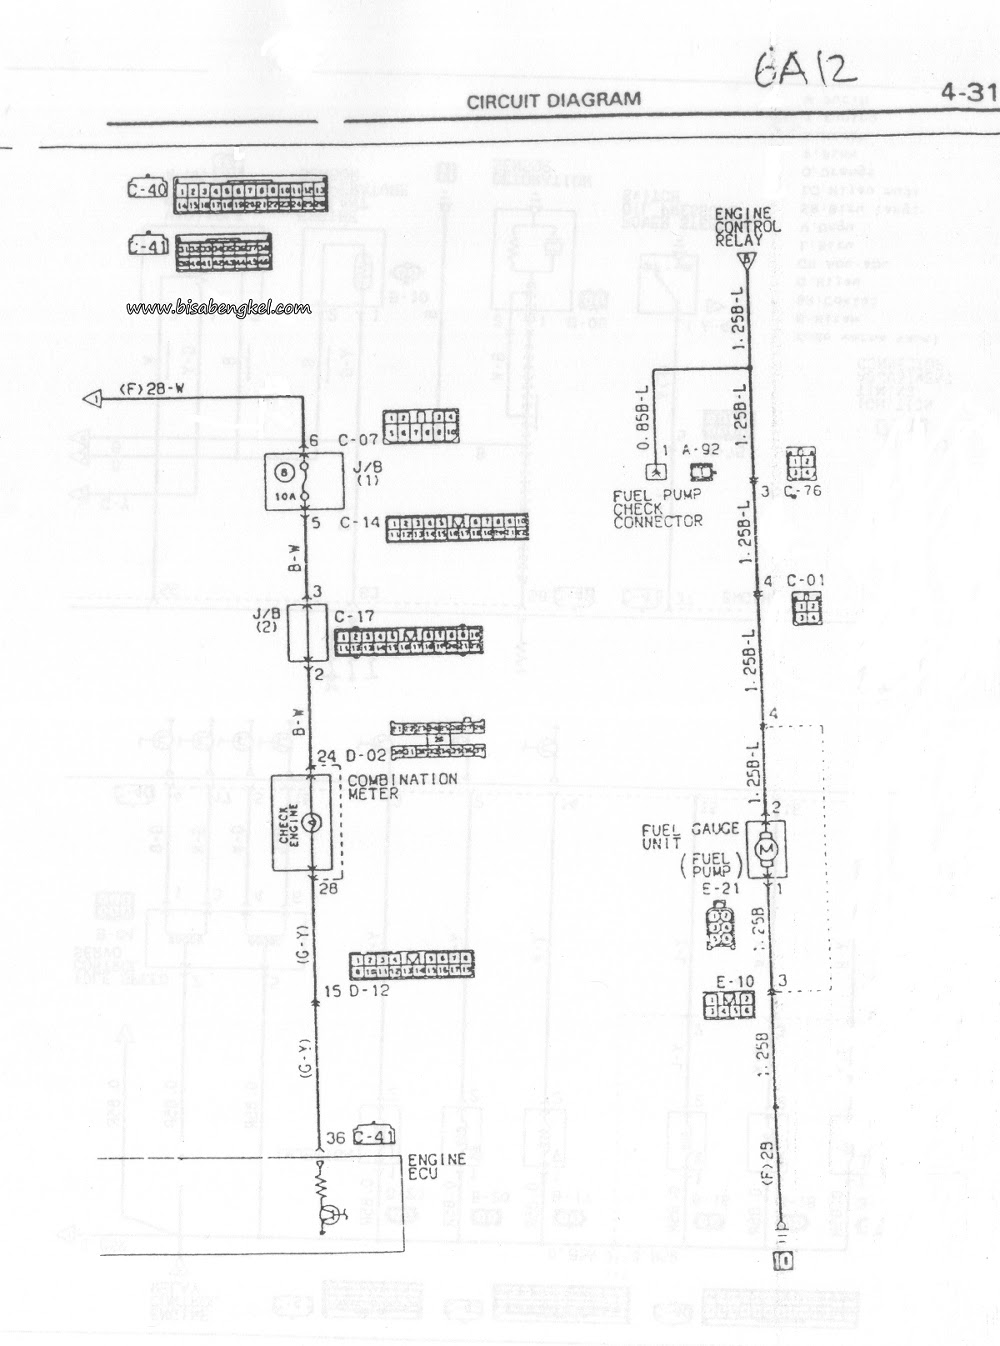 Miraculous Wiring Diagram Ecu T120Ss Wiring Diagram Update Wiring Cloud Oideiuggs Outletorg